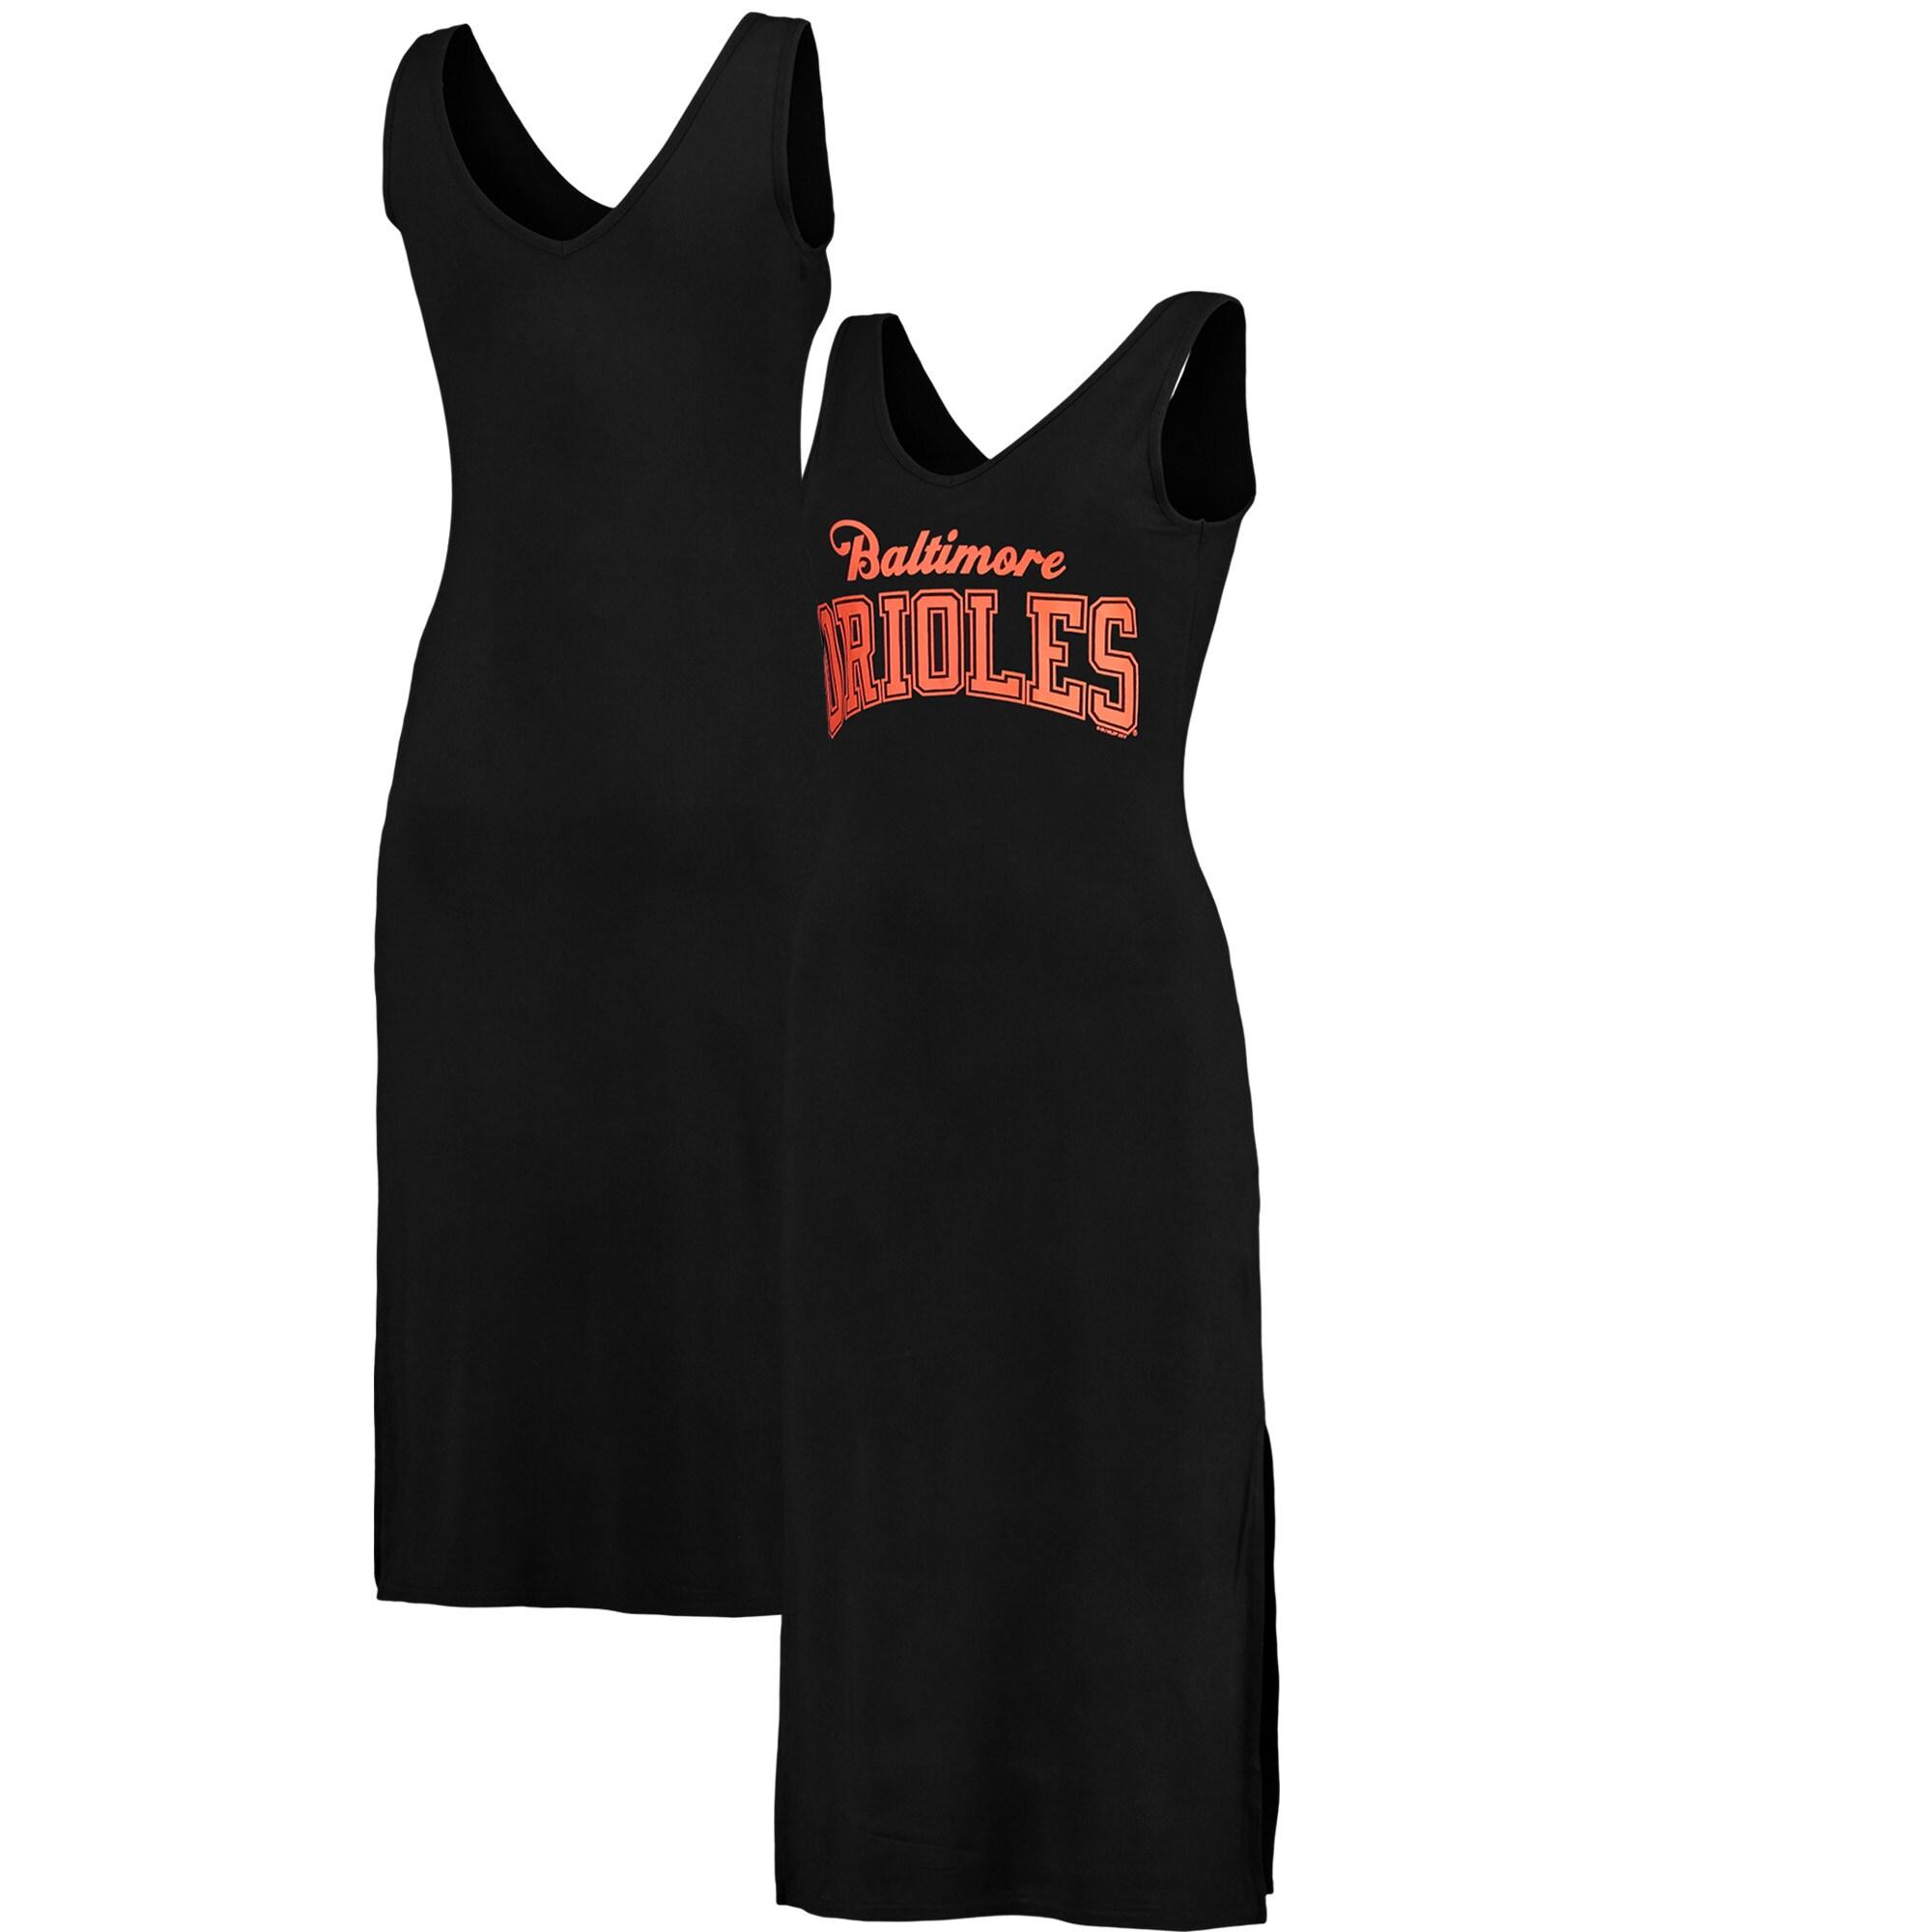 Baltimore Orioles G-III 4Her by Carl Banks Women's Sideline Maxi Dress - Black/Orange